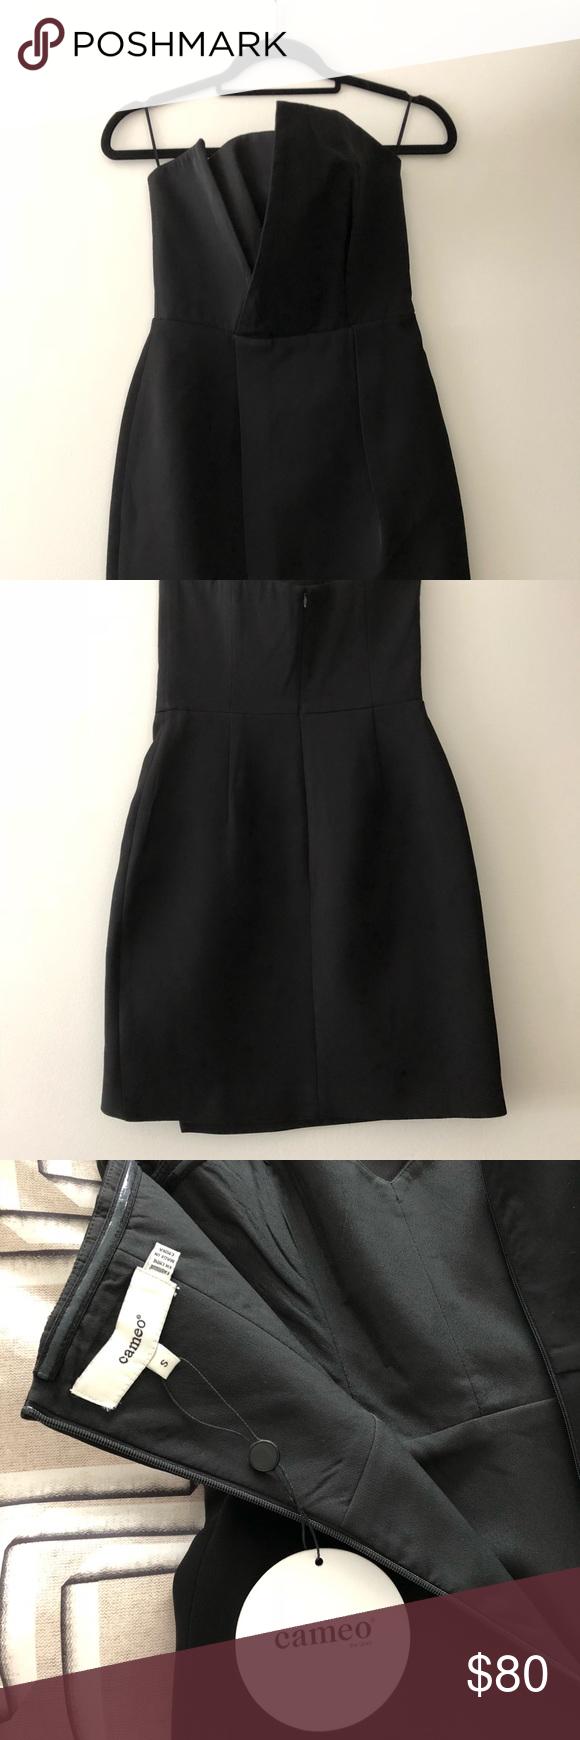 Cameo Little Black Dress Black Structure Overlay Mini Dress Zipper Back C Meo Collective Dresses Mini Little Black Dress Clothes Design Dresses [ 1740 x 580 Pixel ]